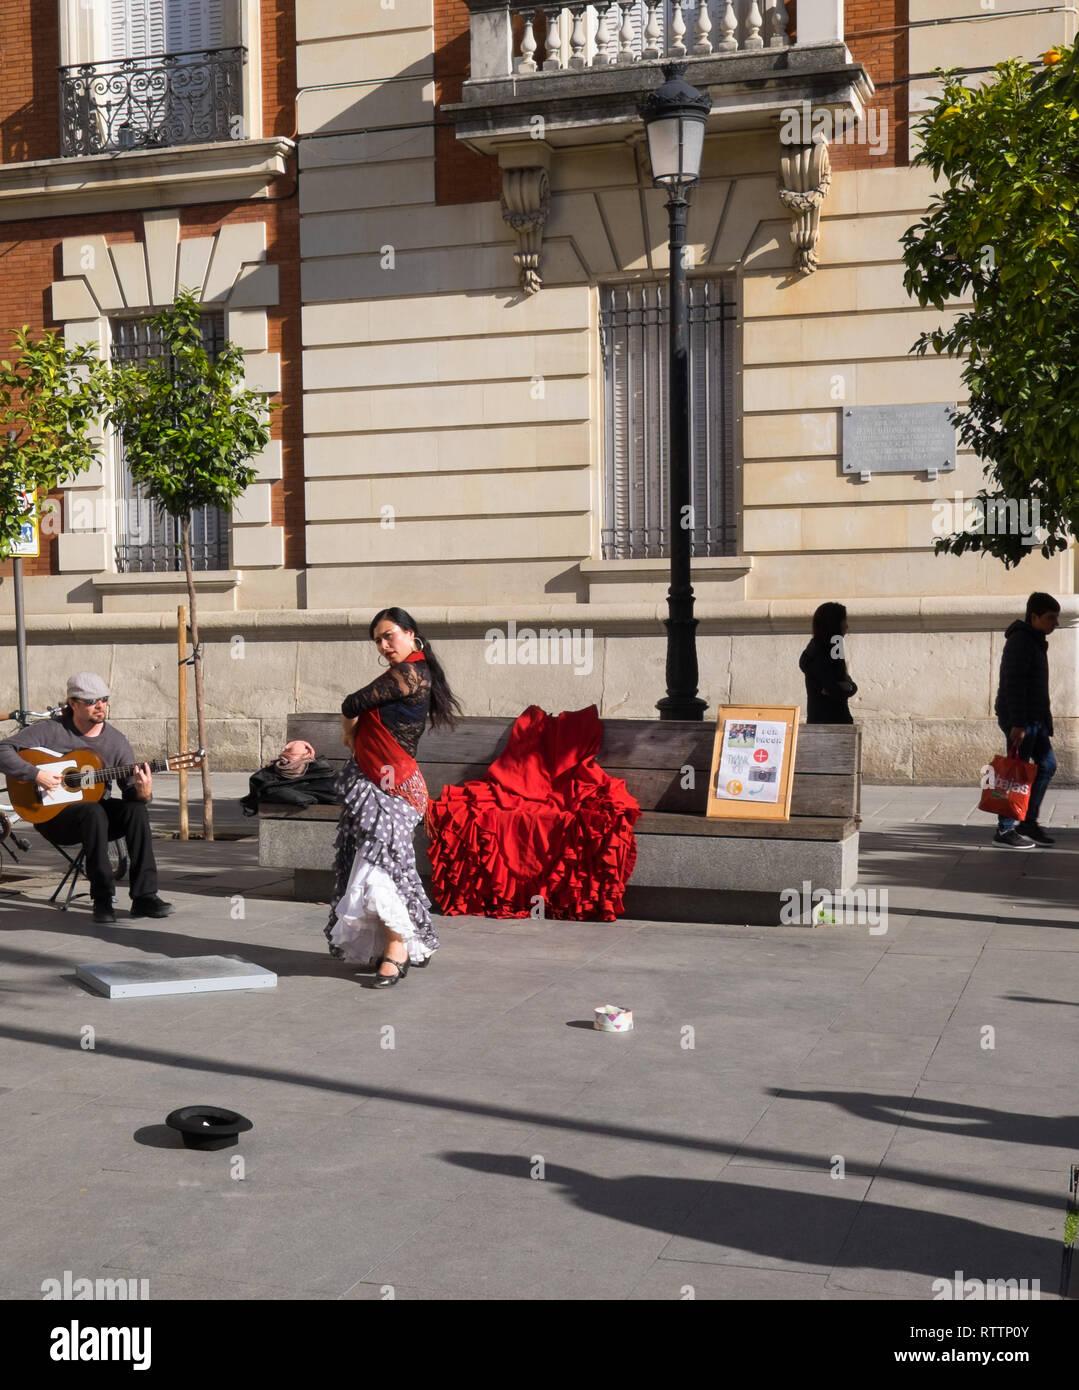 Flamenco dancer & guitarist busking on a Seville street Spain 3.2.19 - Stock Image